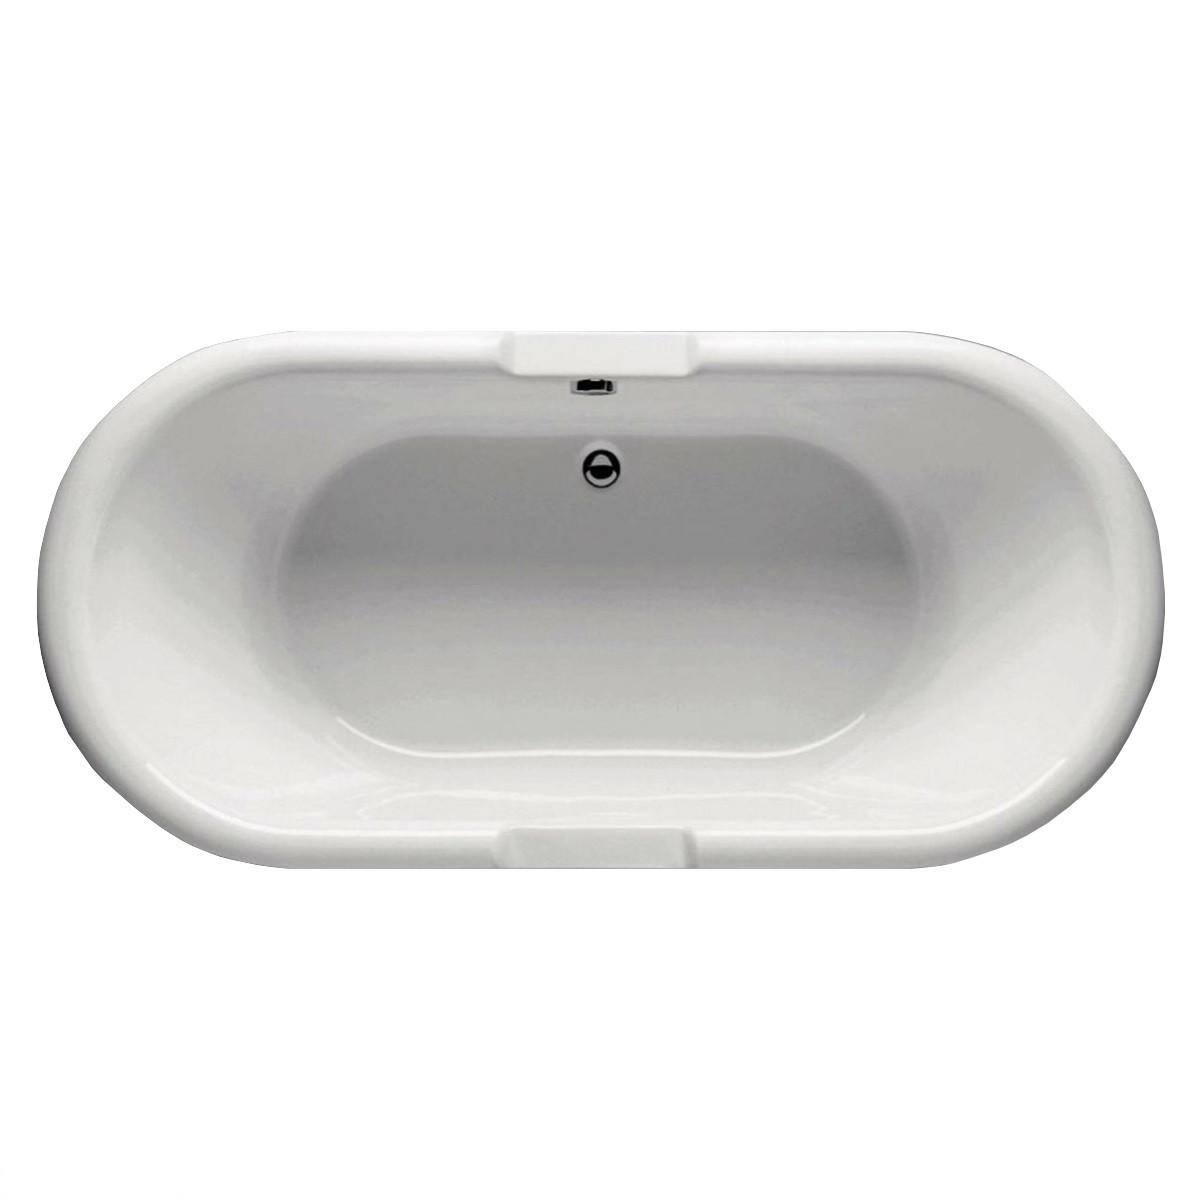 Акриловая ванна RIHO Seth BB2200500000000 180